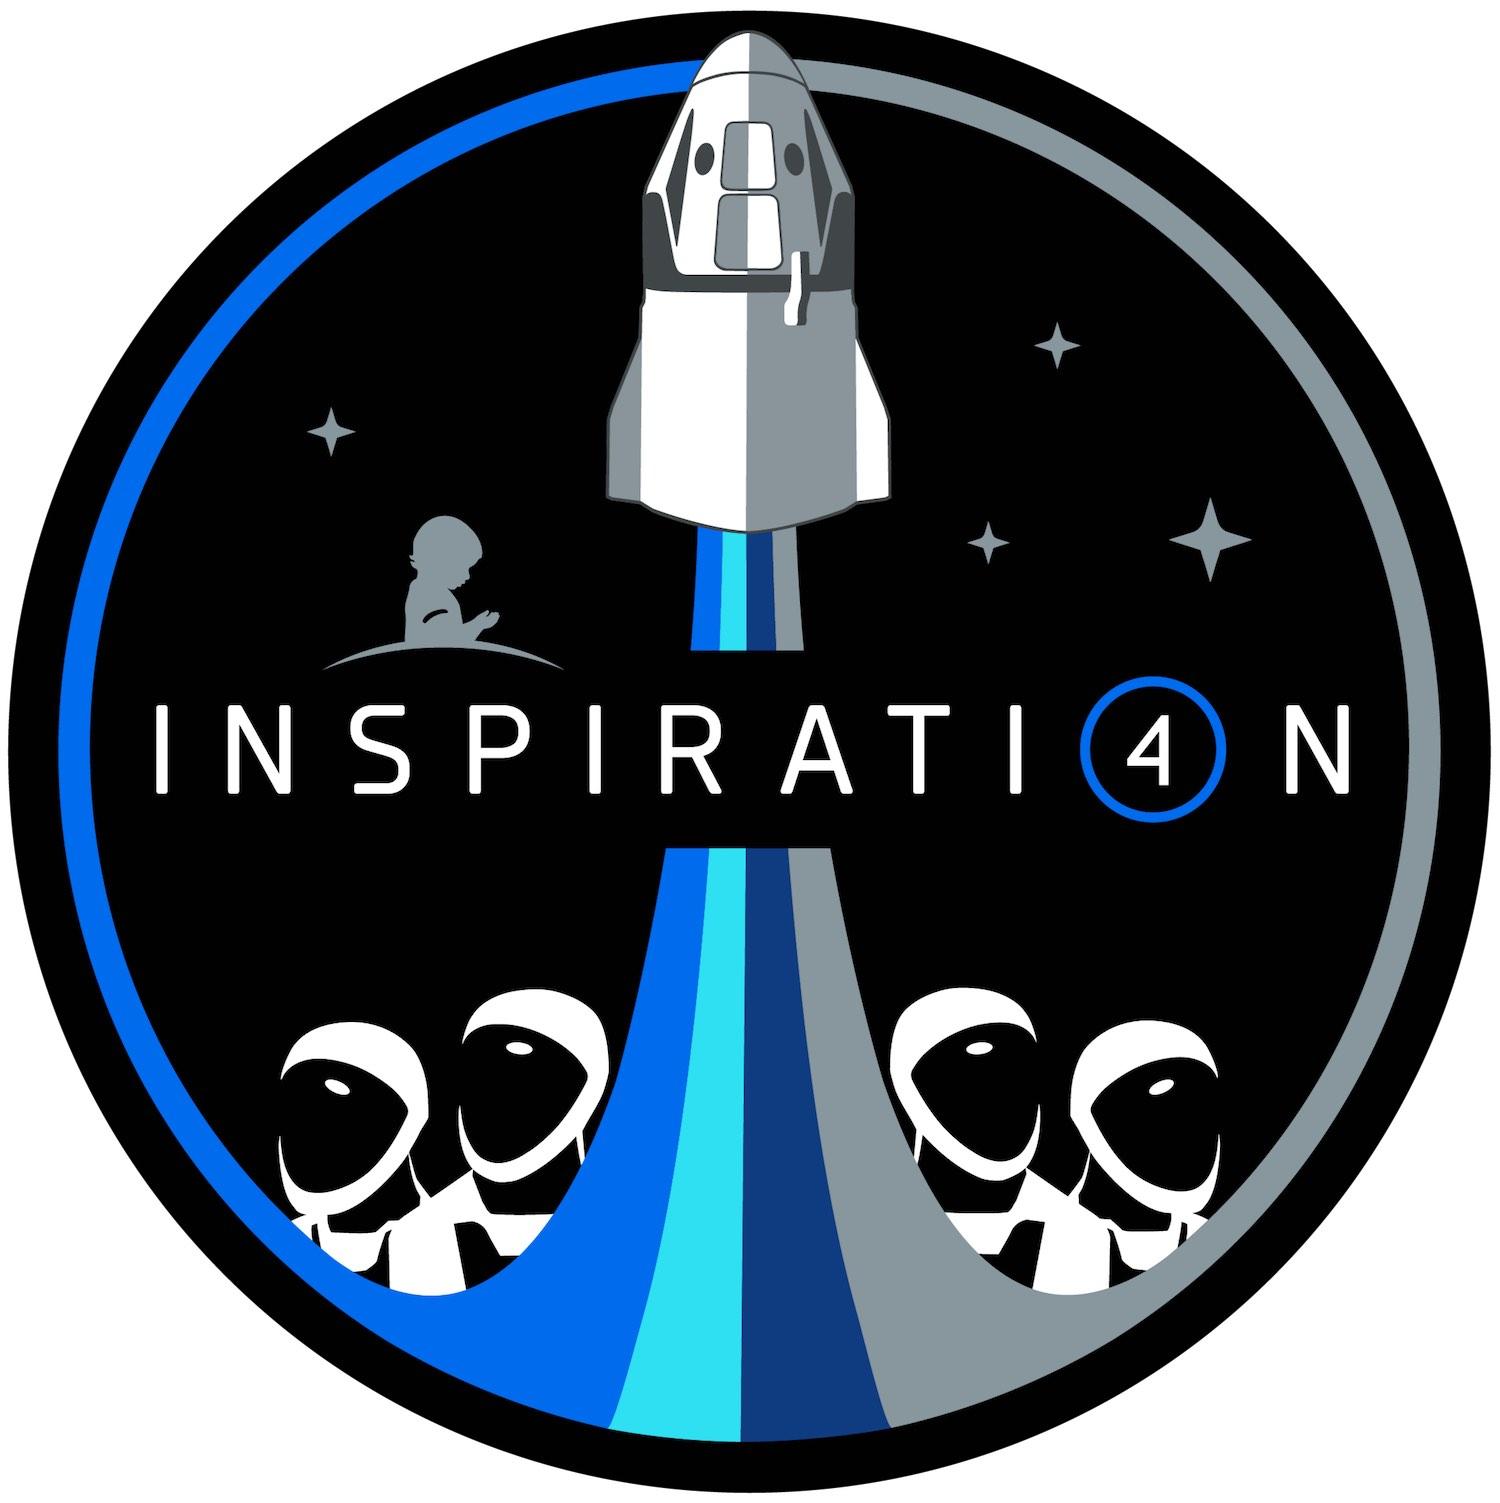 Parche Misión Inspiration4